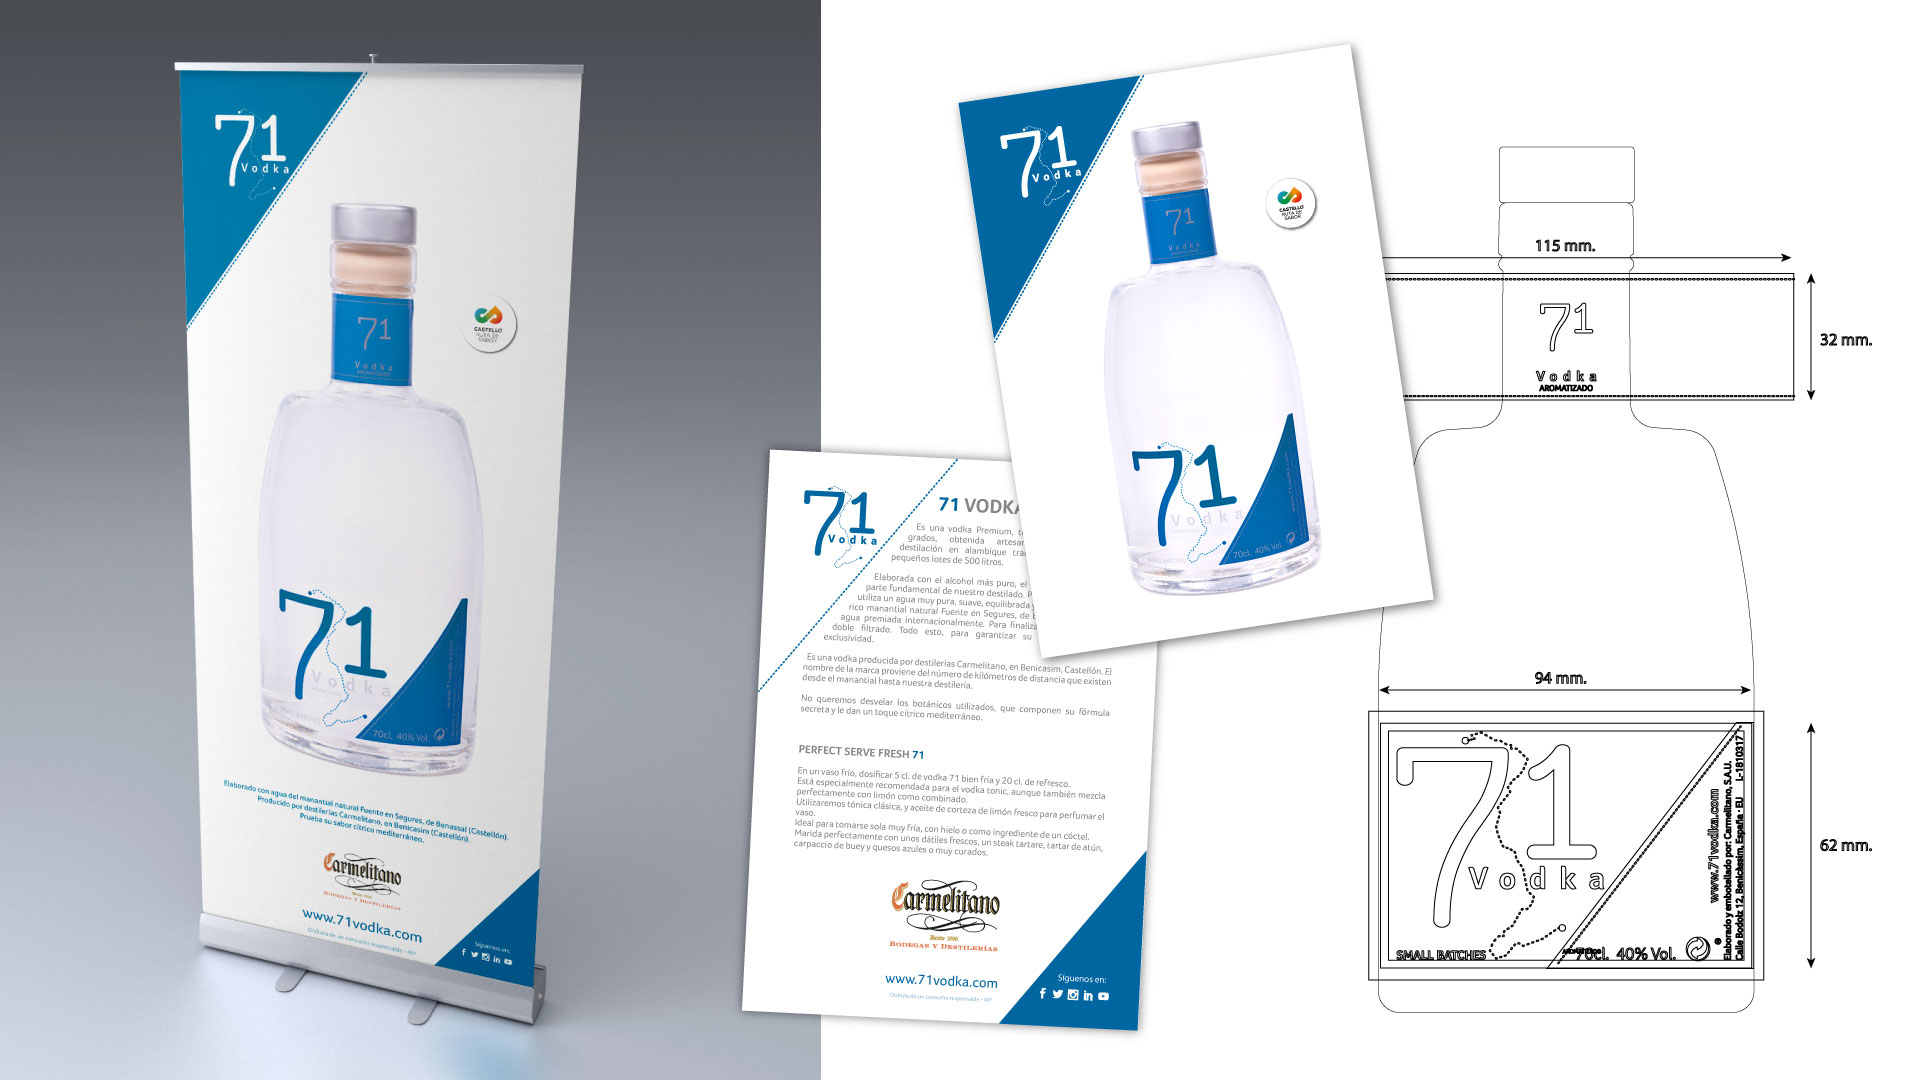 Digitus-Carmelitano-71vodka-branding-03